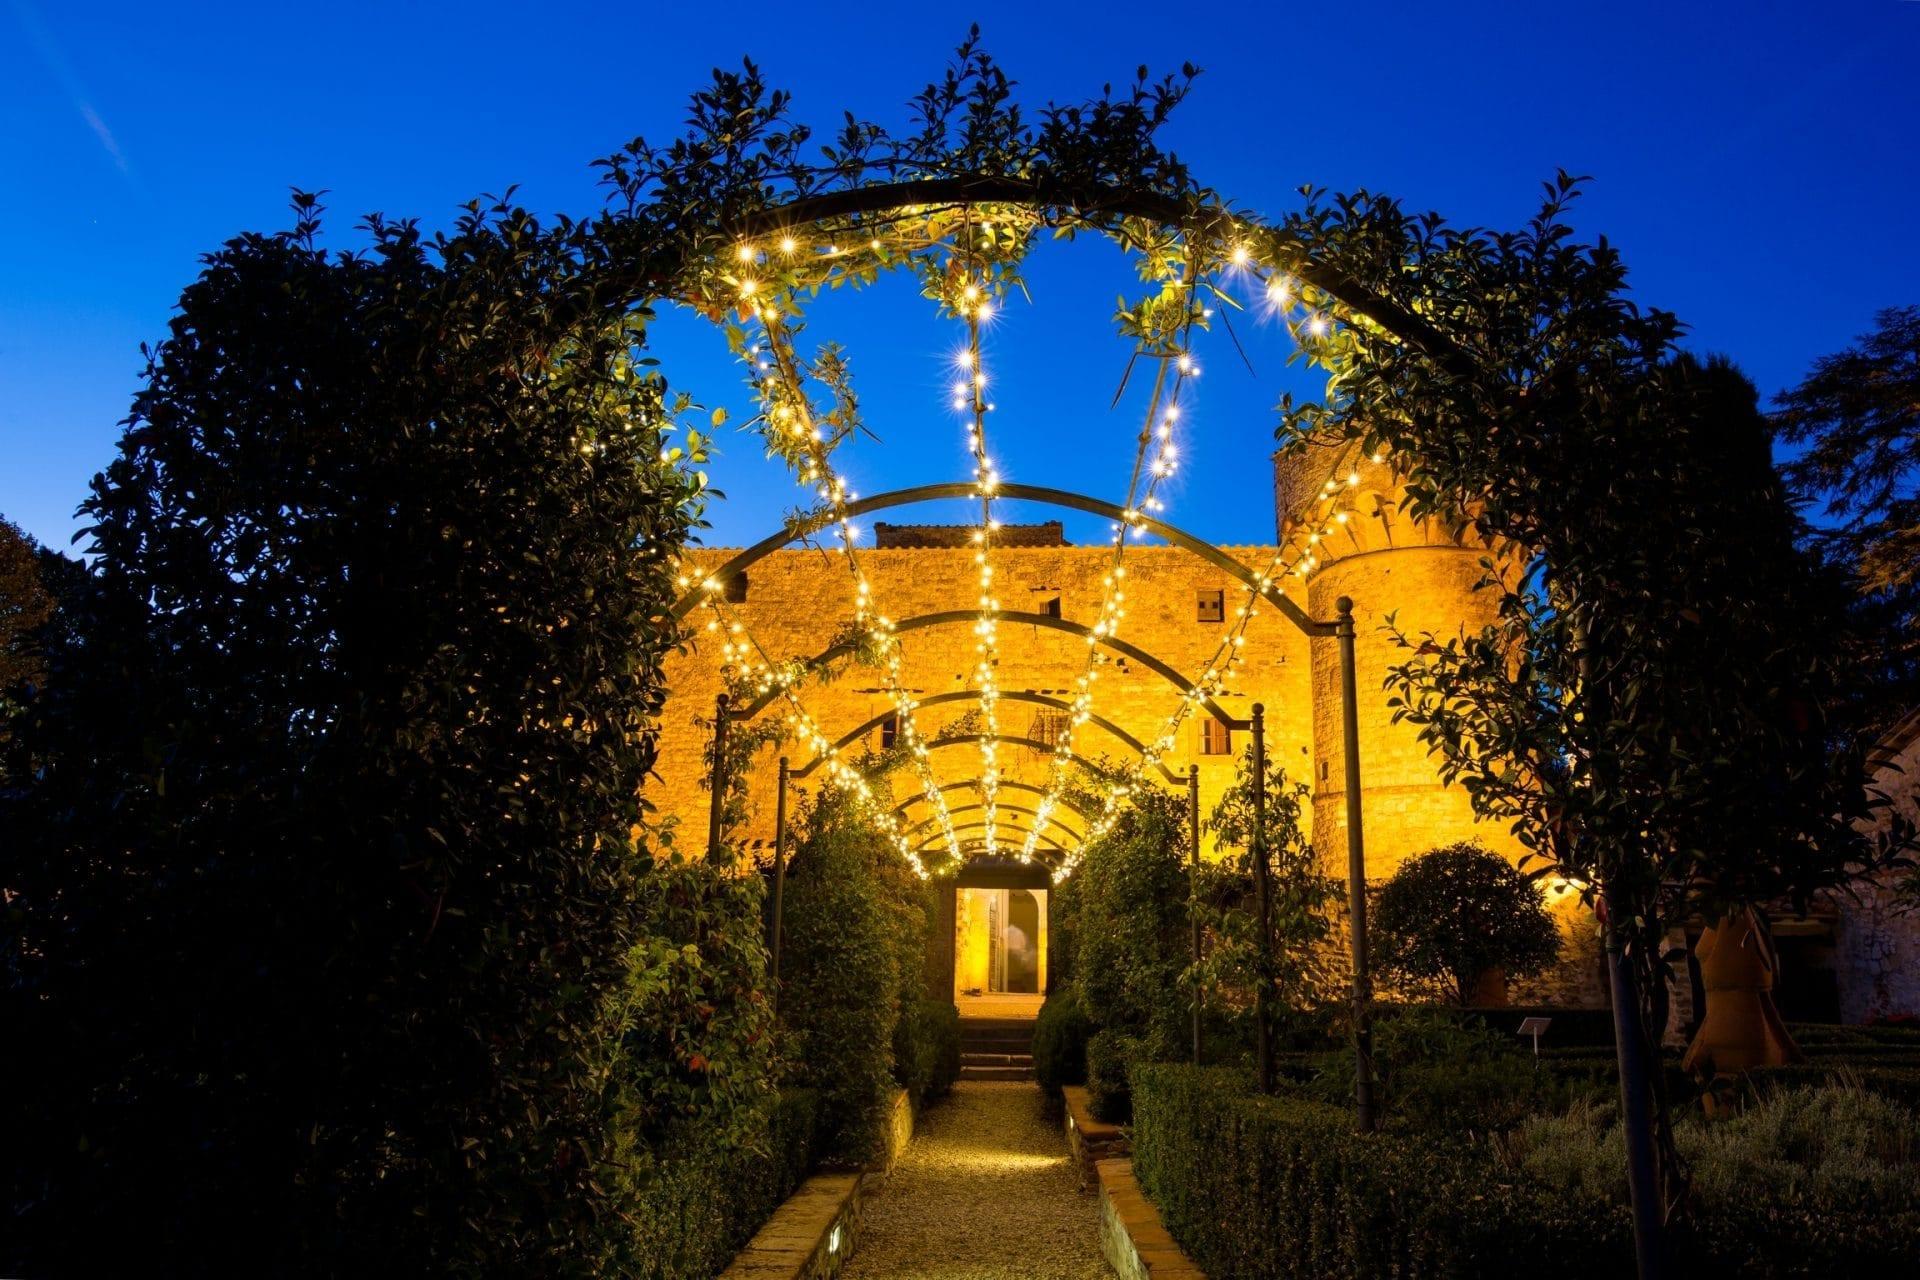 Castello Castle di Meleto fairy lights catenaria Lampadine Kaleydo entertainment